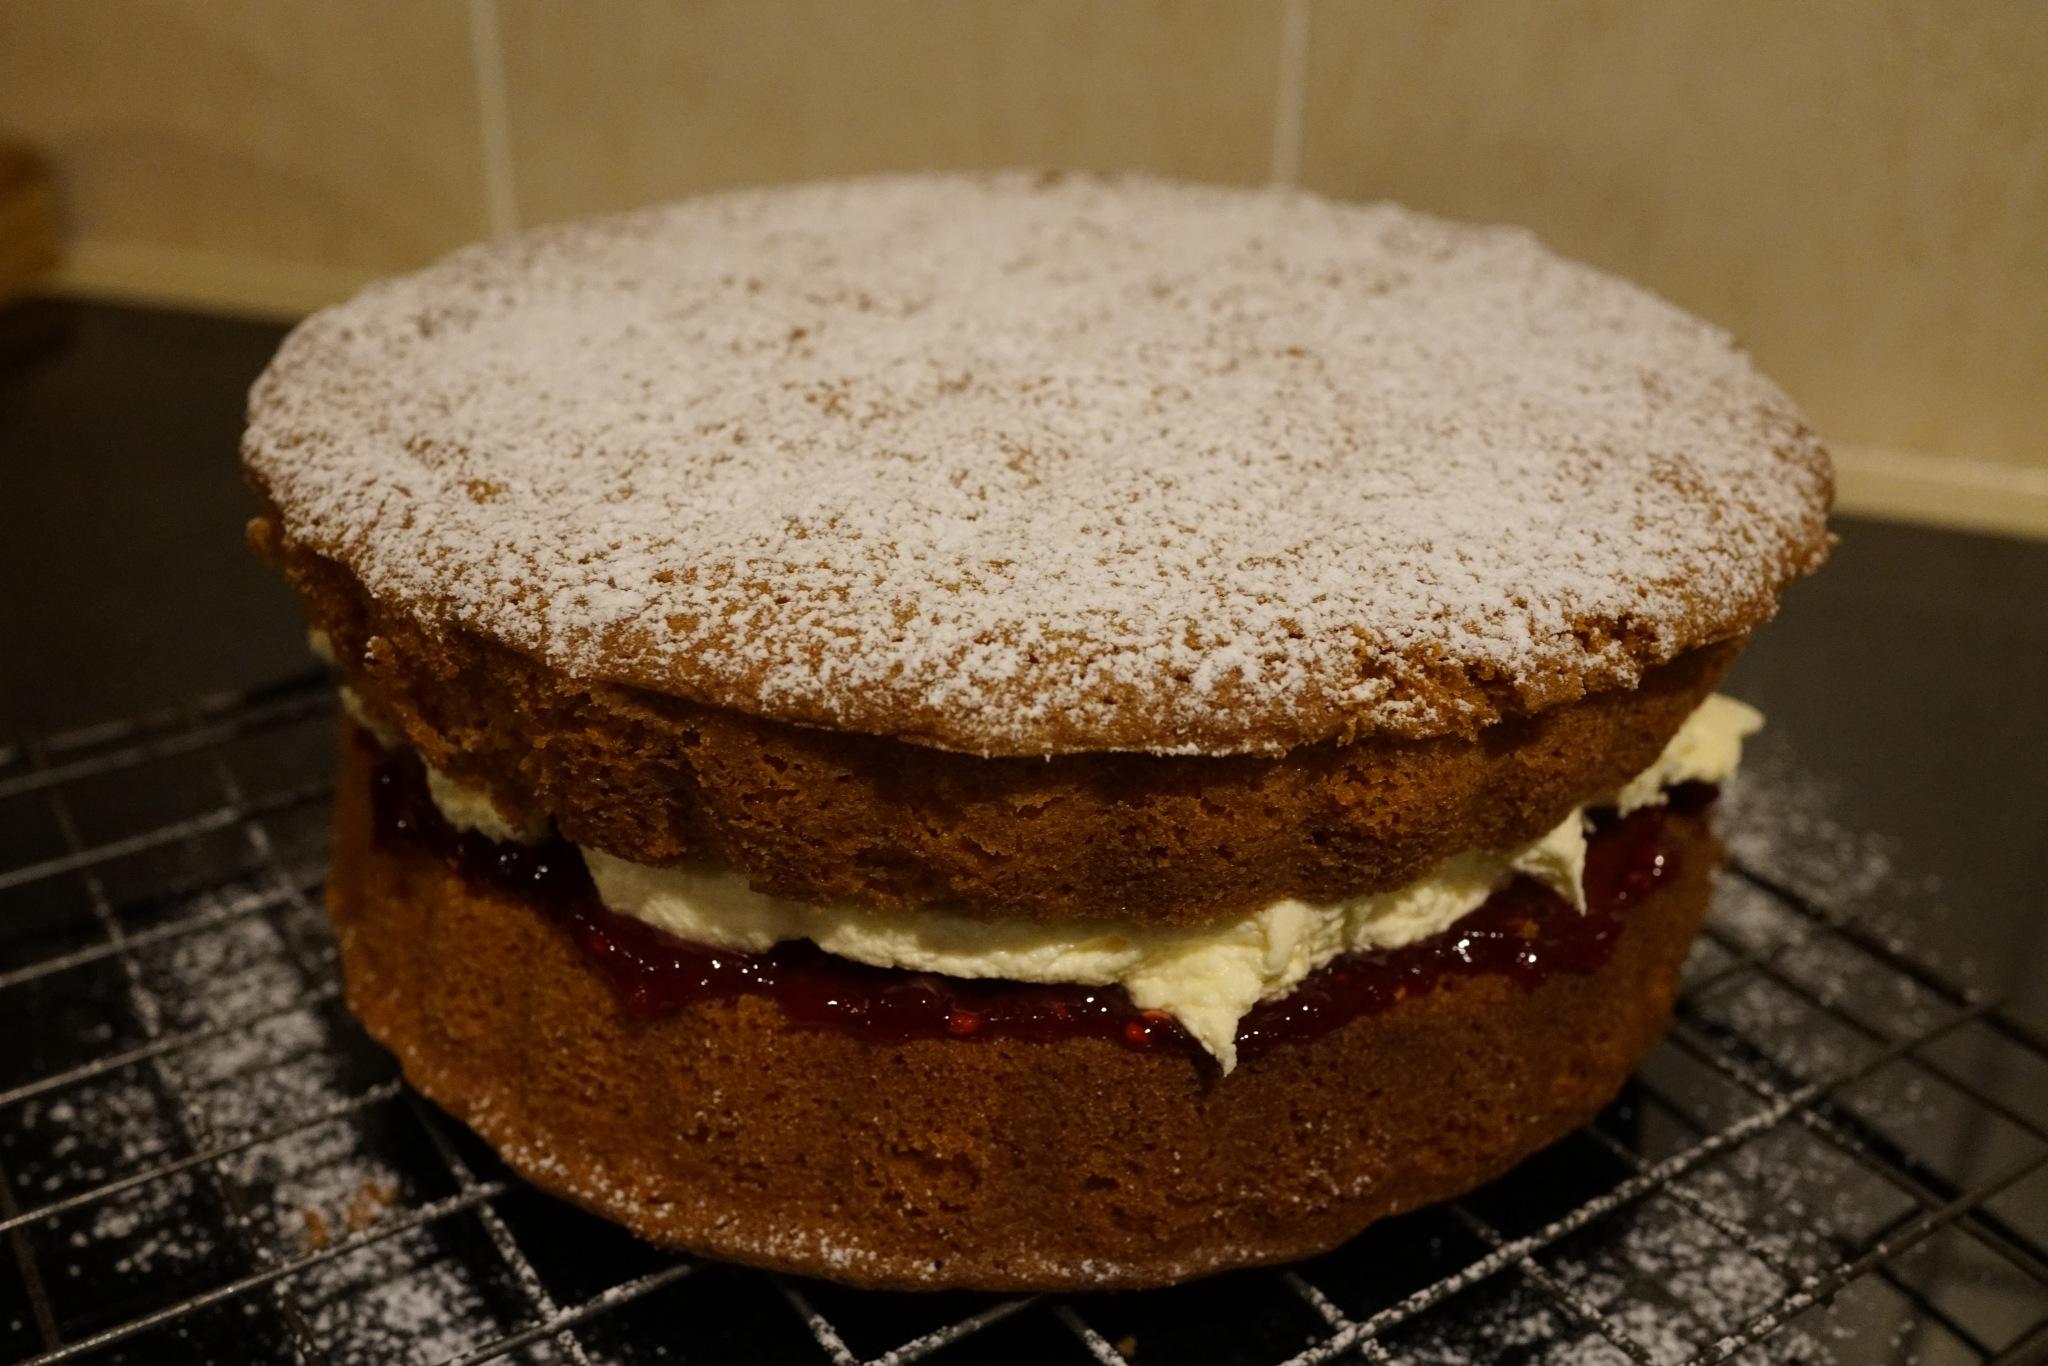 Home Baked Cake! by Simon Ciappara